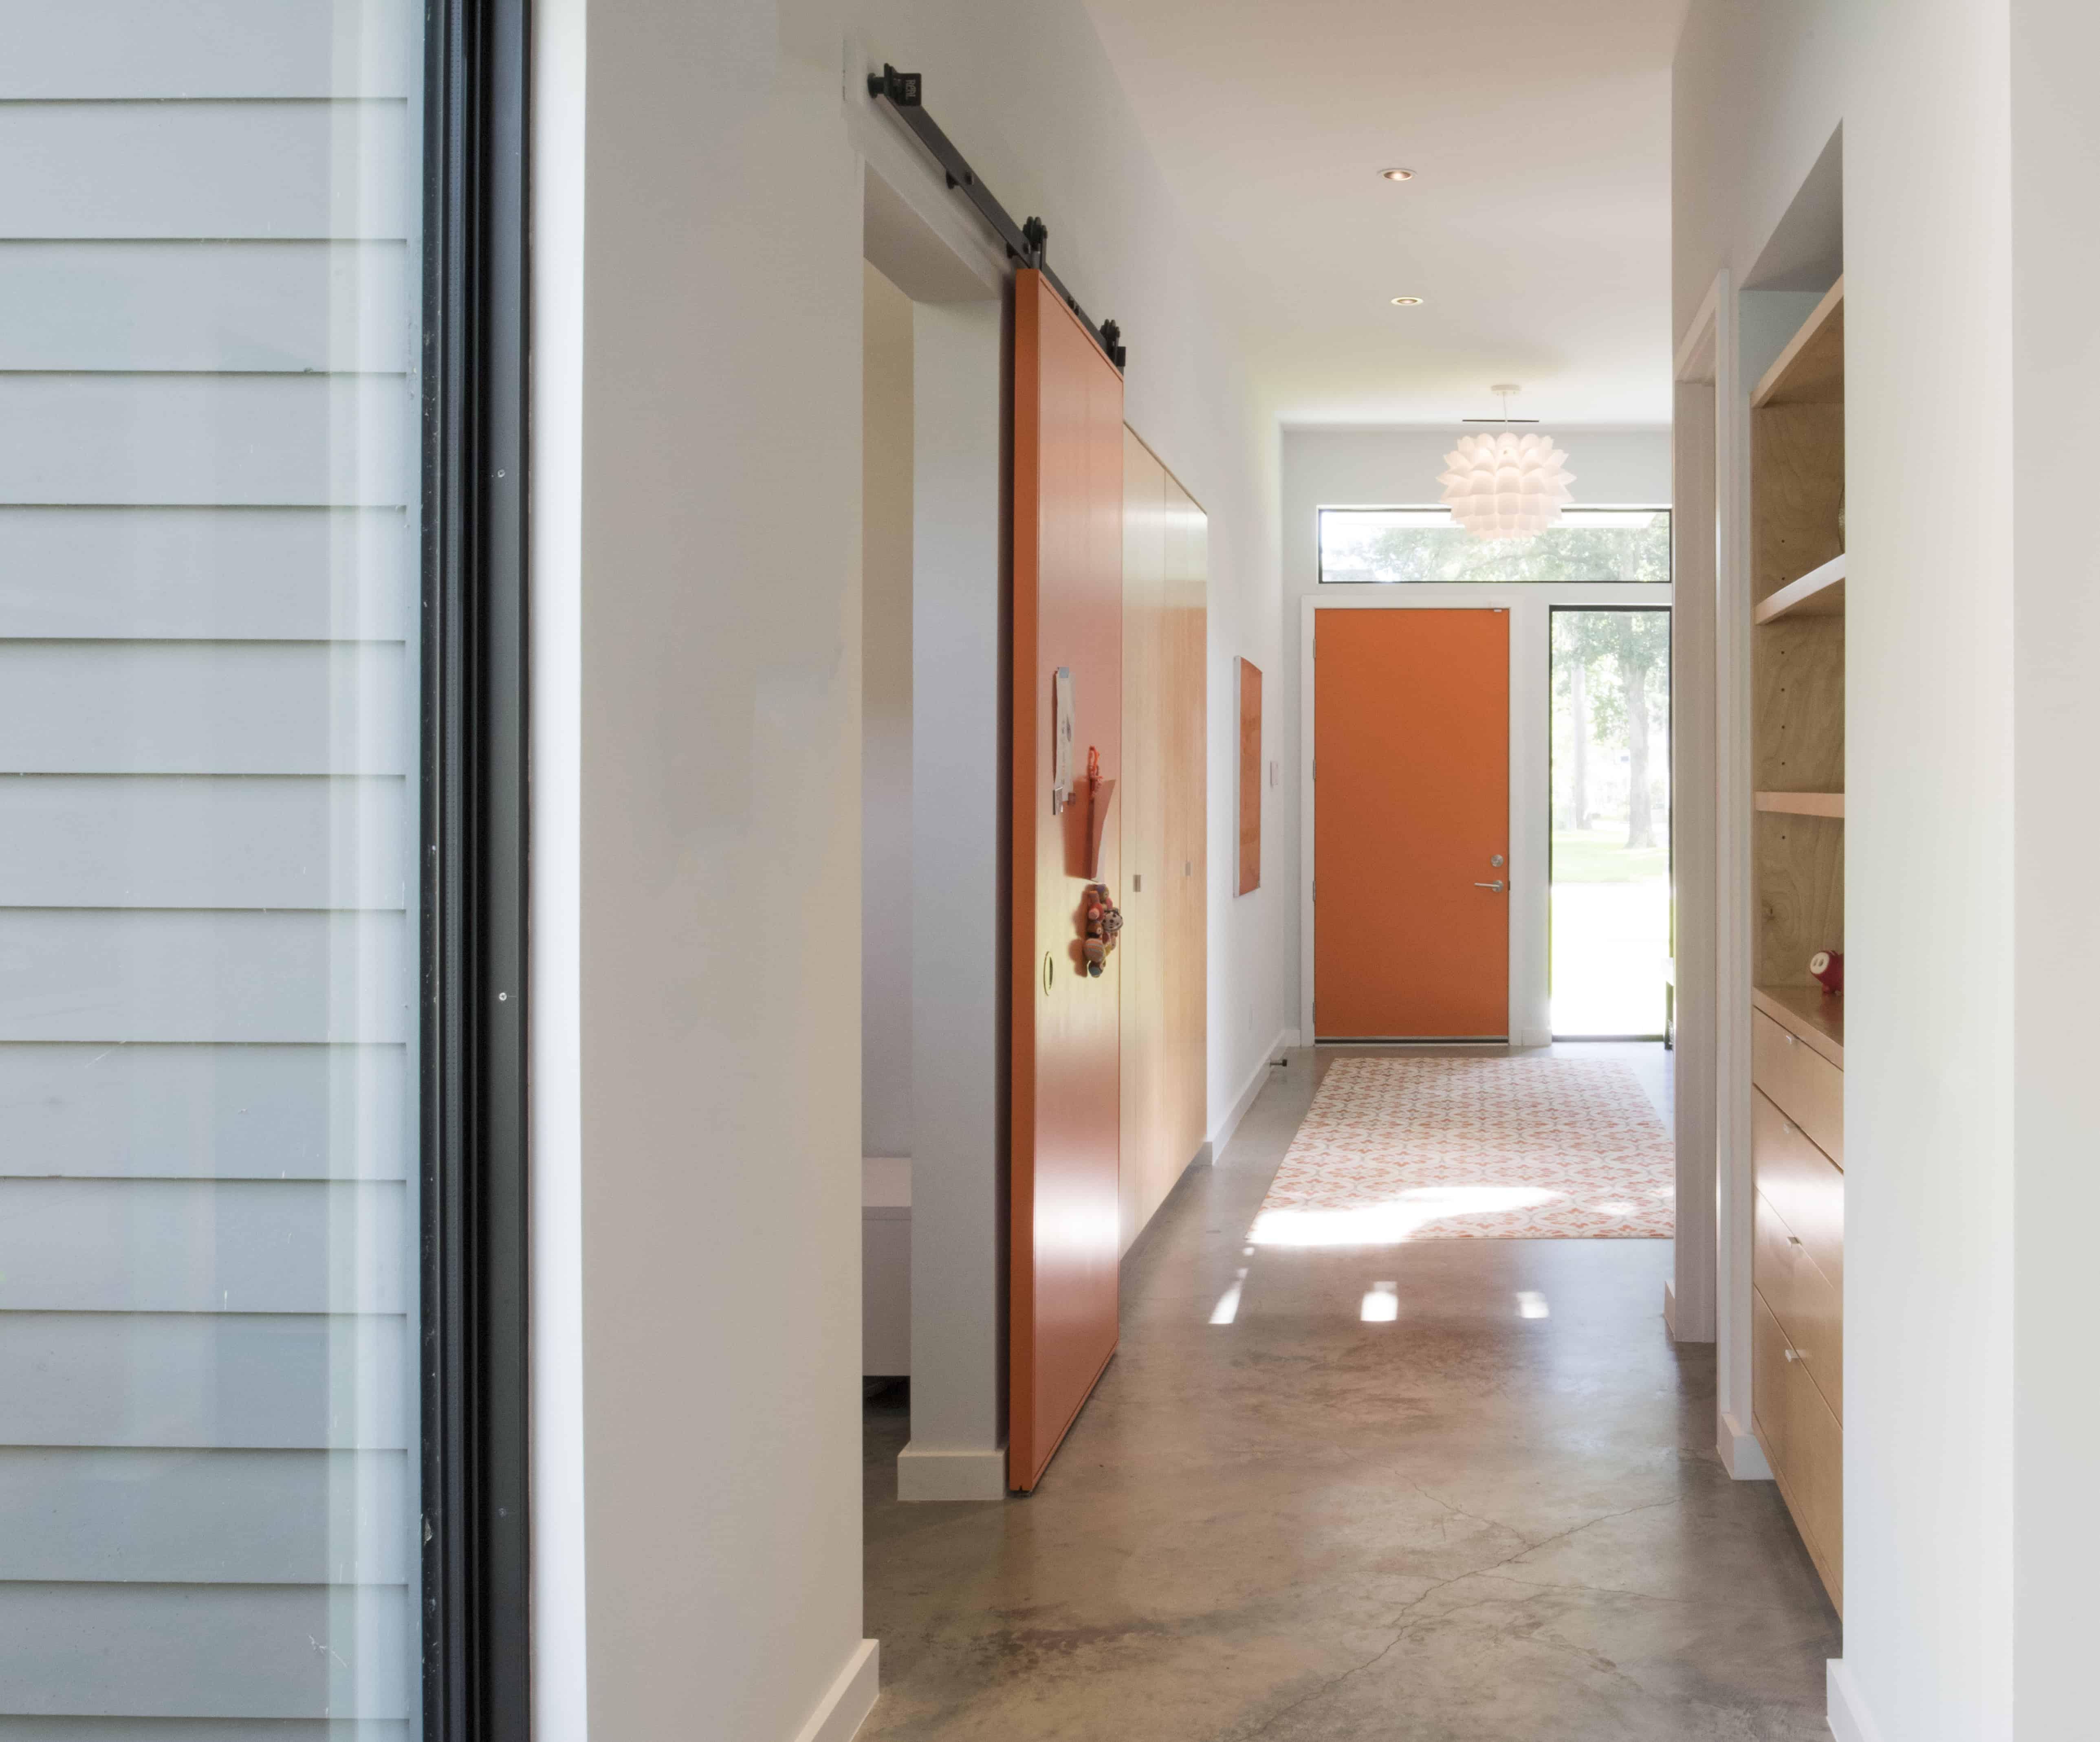 Garden Oaks Modern Home with orange accents